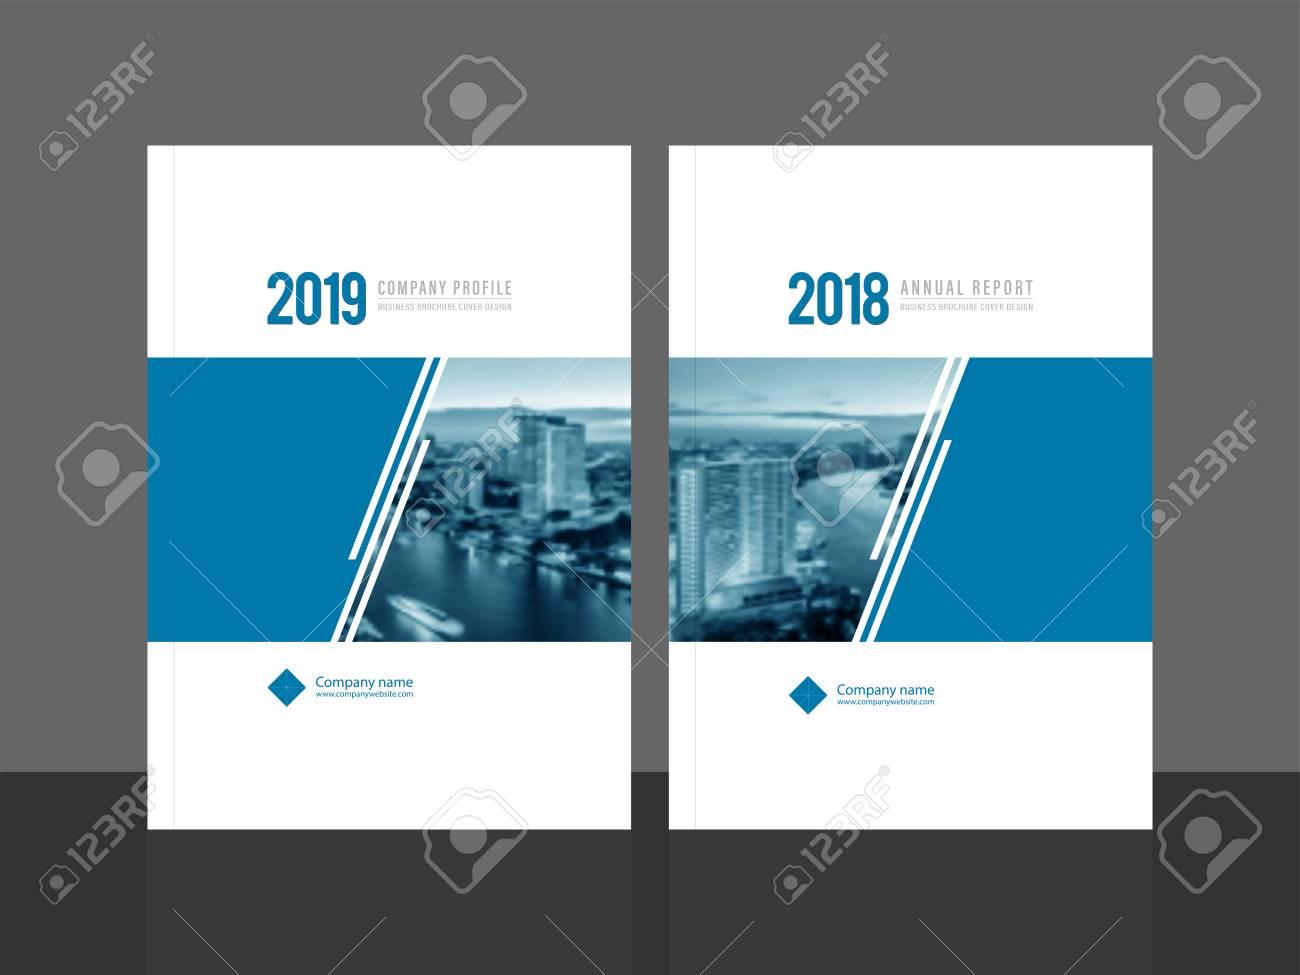 corporate cover design for annual report and company profile